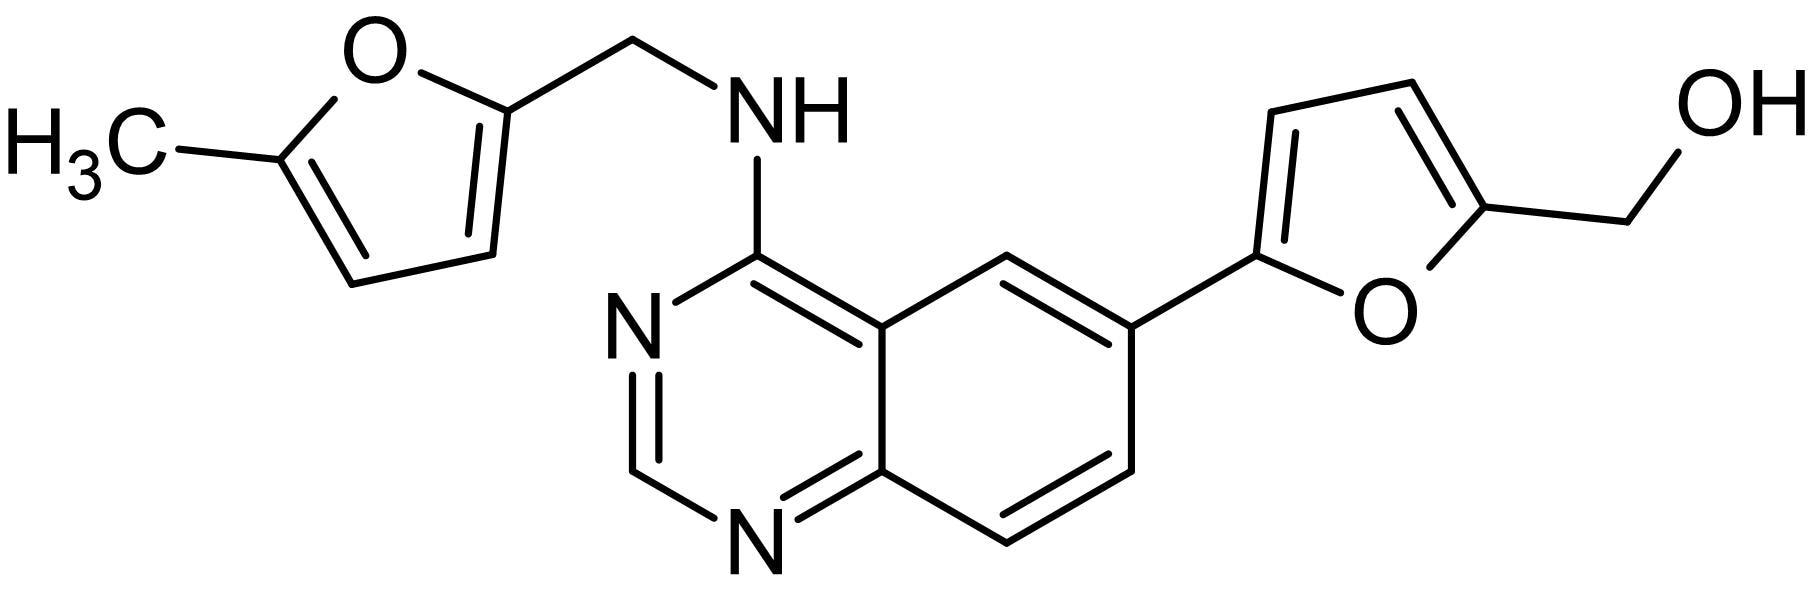 Chemical Structure - ML-167, Cdc2-like kinase 4 inhibitor (ab146151)